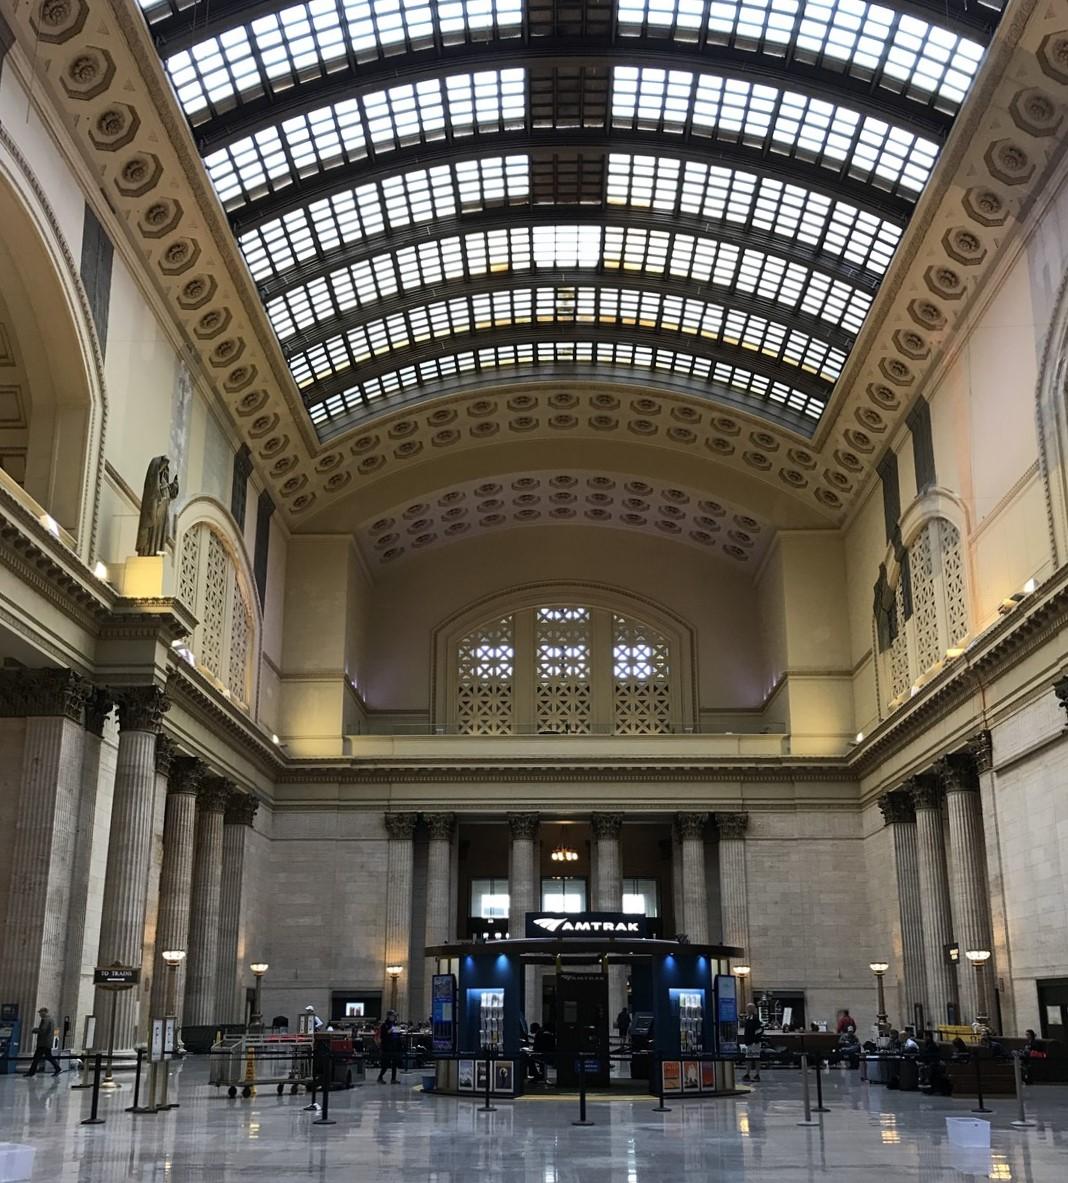 2017 10 15 395 Chicago Open House - Union Station.jpg